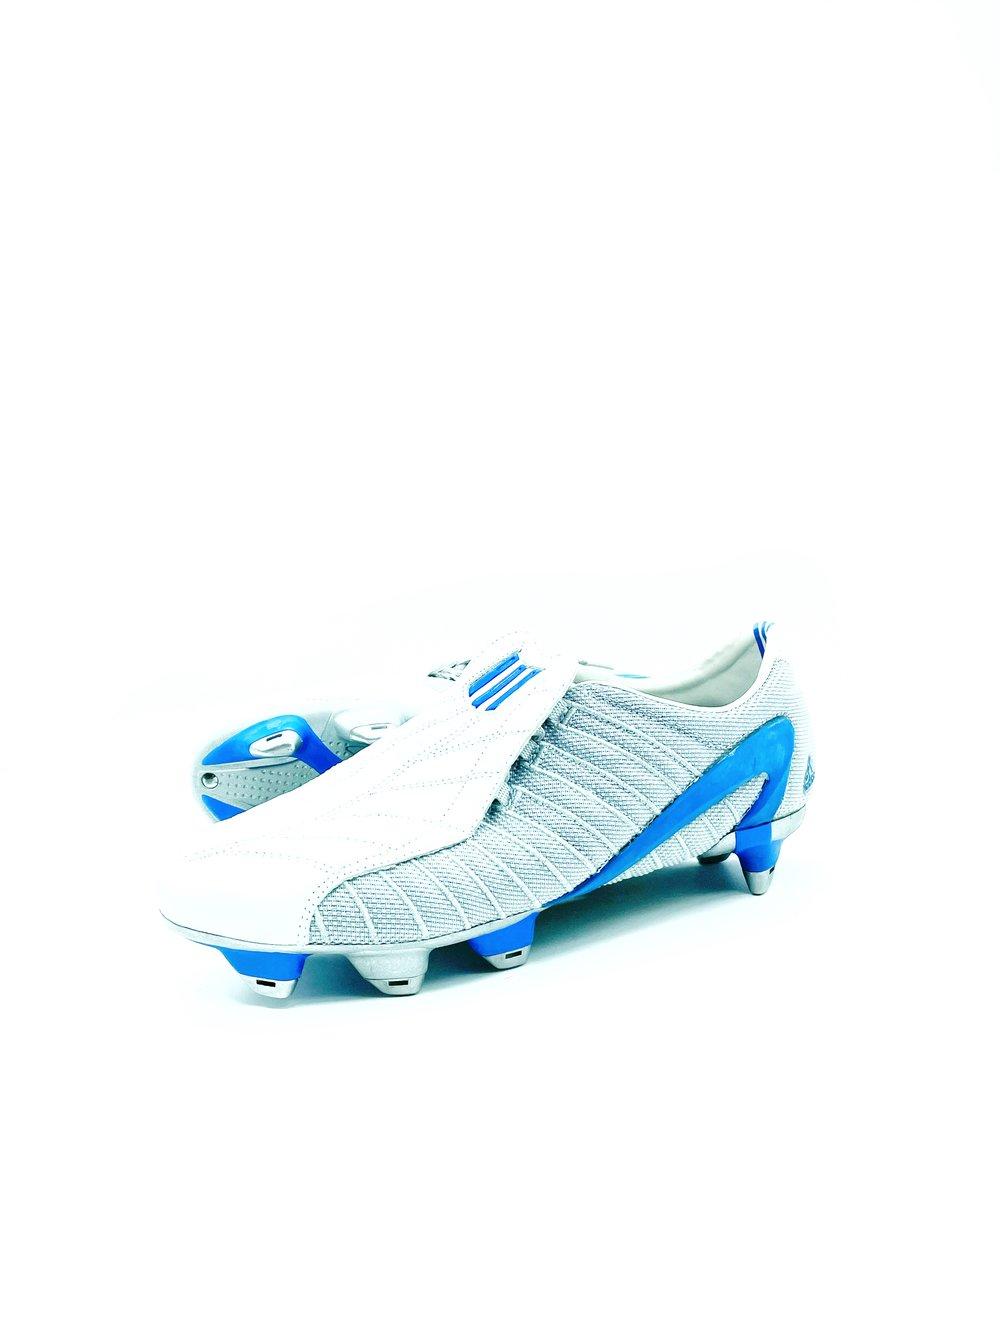 Image of Adidas F50 XTRX SG BLUE